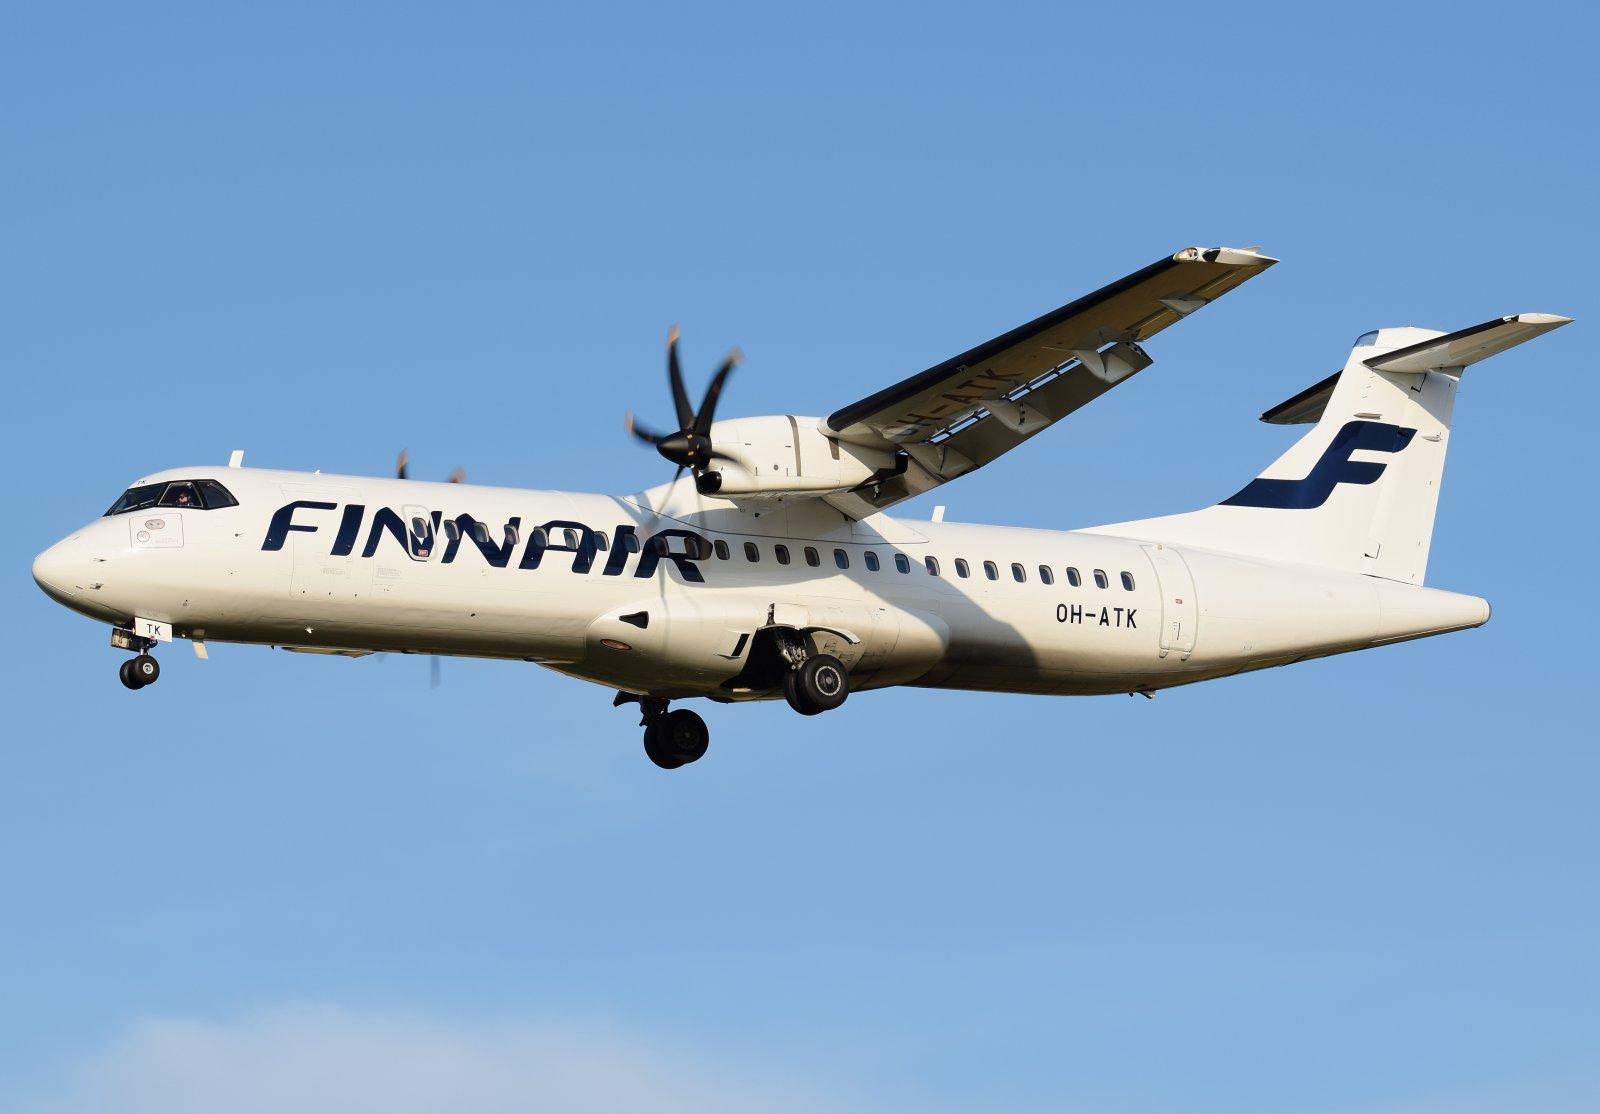 OH-ATK - ATR 72-500 - Finnair - 22.8.2019